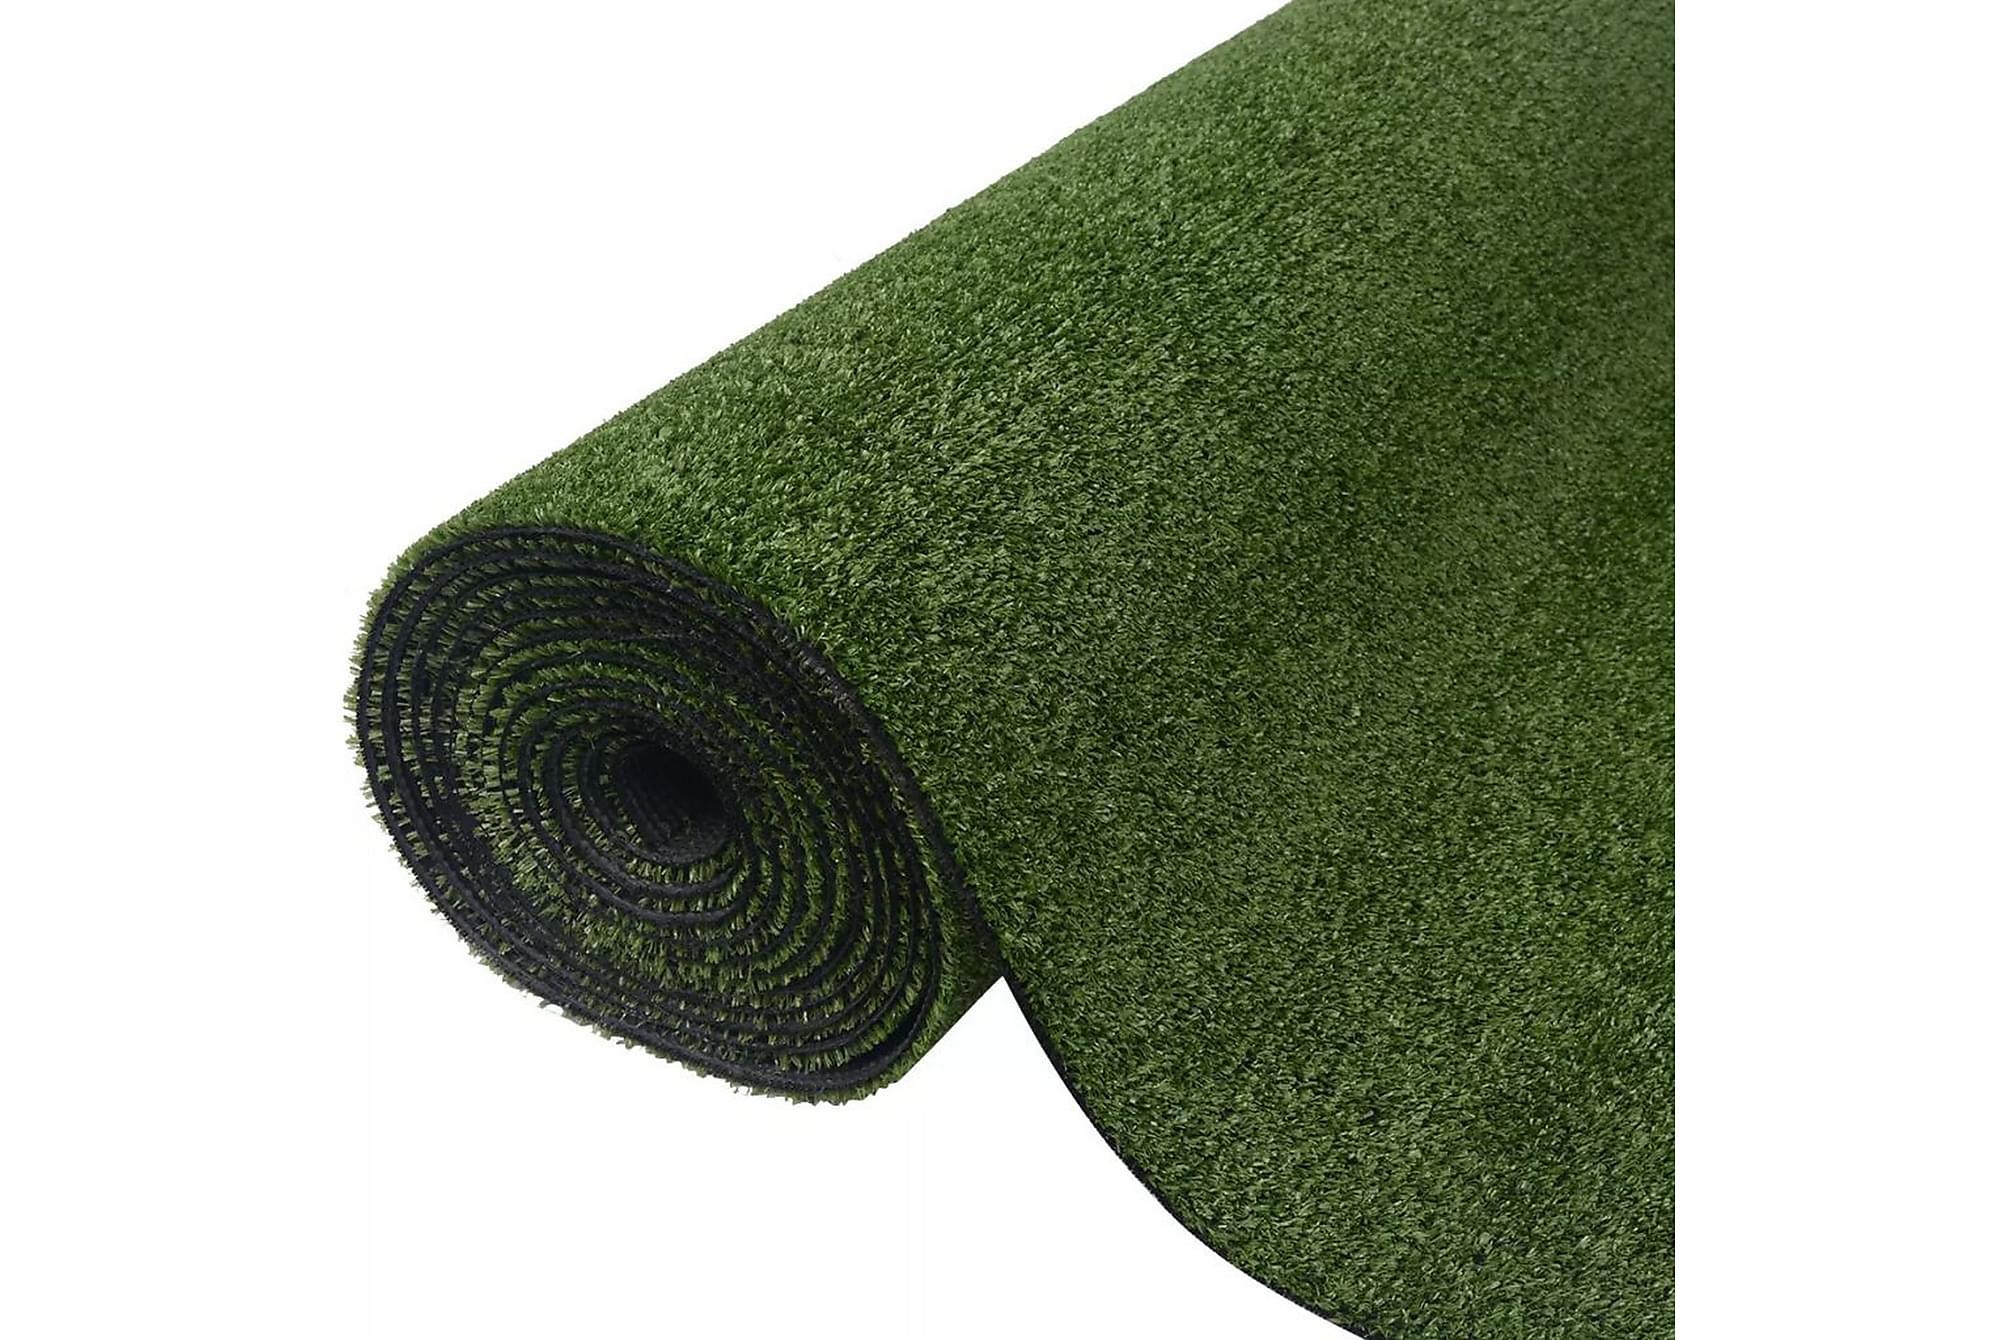 Konstgräsmatta 1,5×5 m/7-9 mm grön